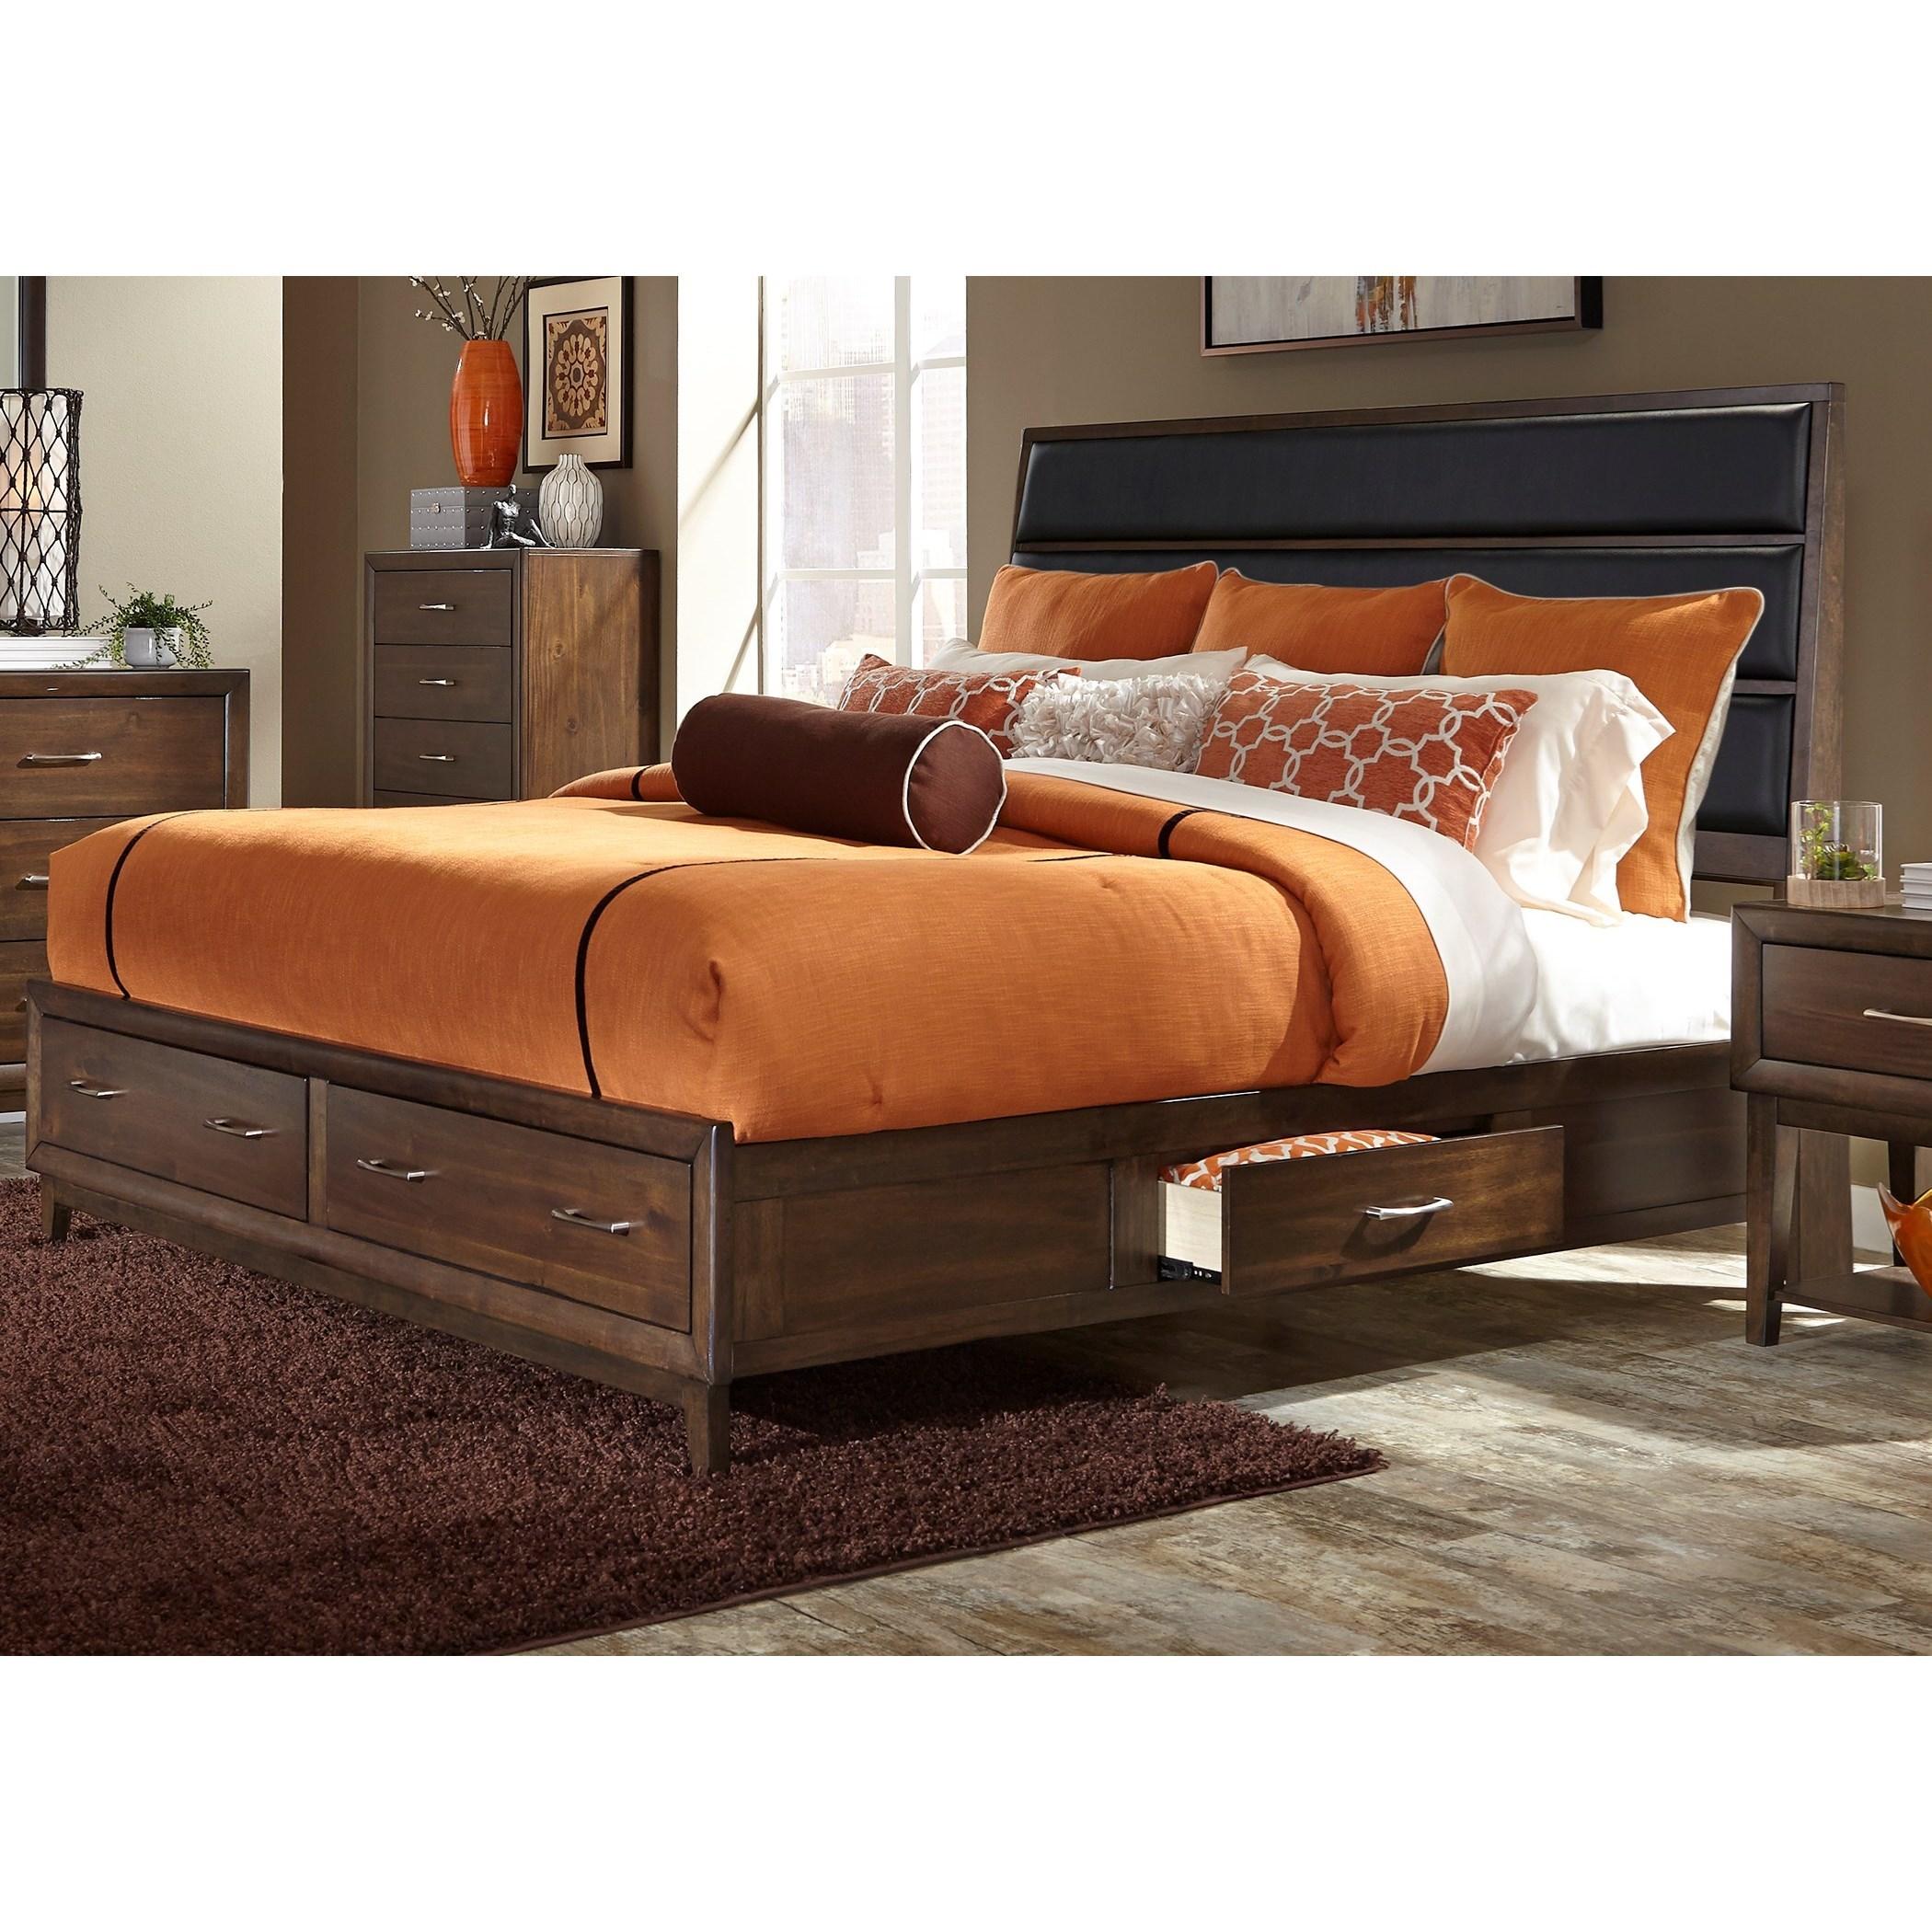 Liberty Furniture Hudson Square Bedroom Queen Storage Bed  - Item Number: 365-BR-QUS